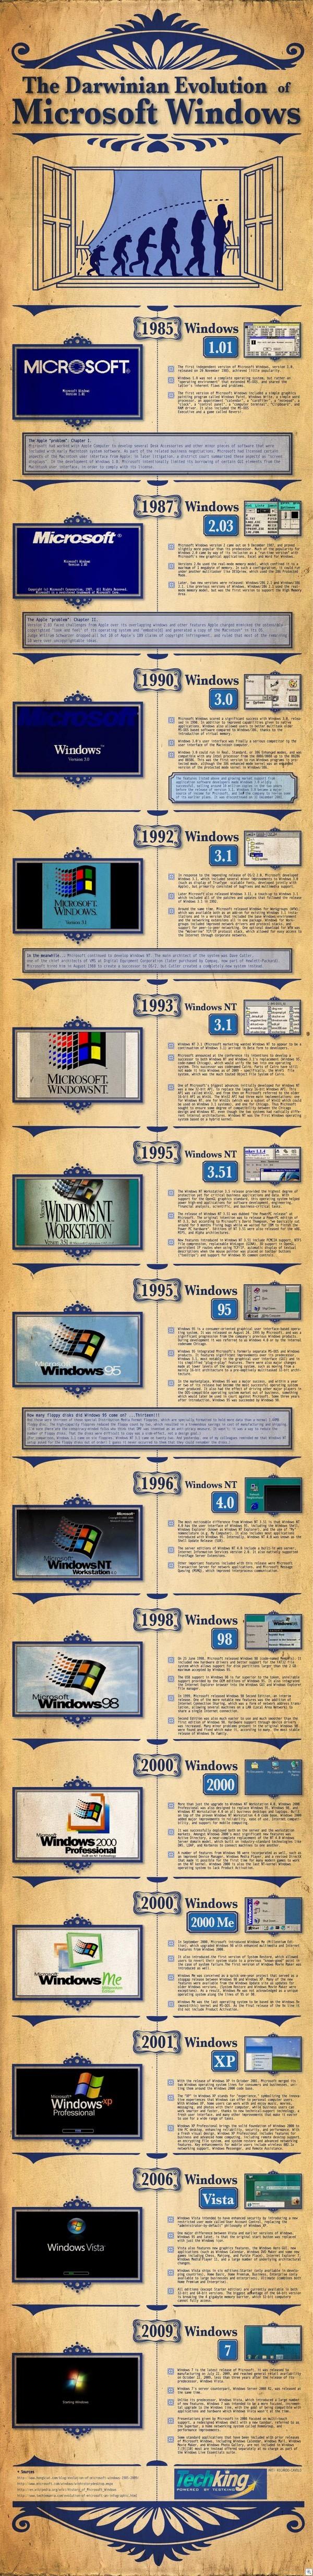 The Darwinian Evolution of Microsoft Windows infographic